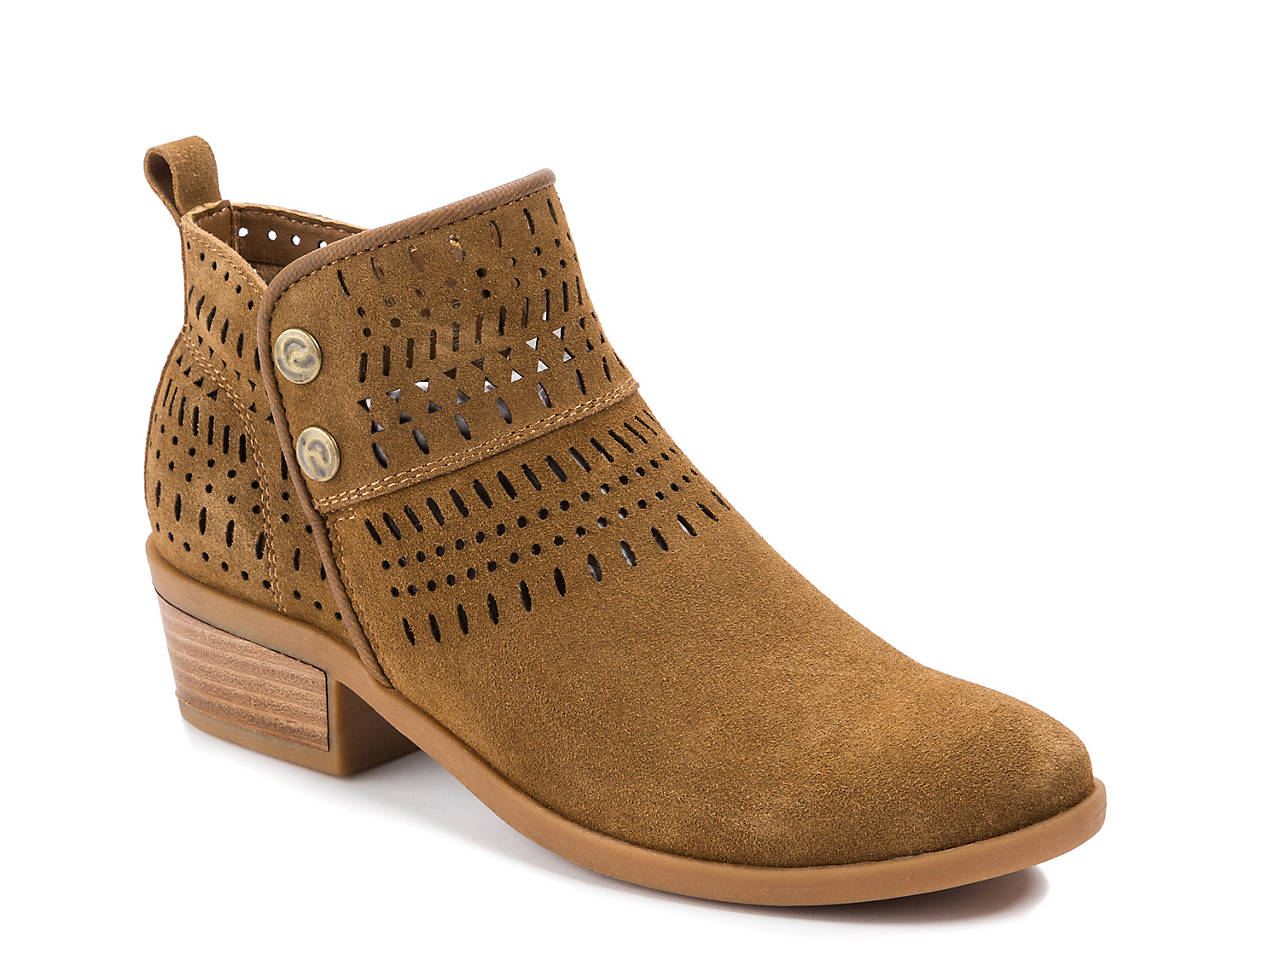 35acf7d30bf Bare Traps Greta Bootie Women s Shoes